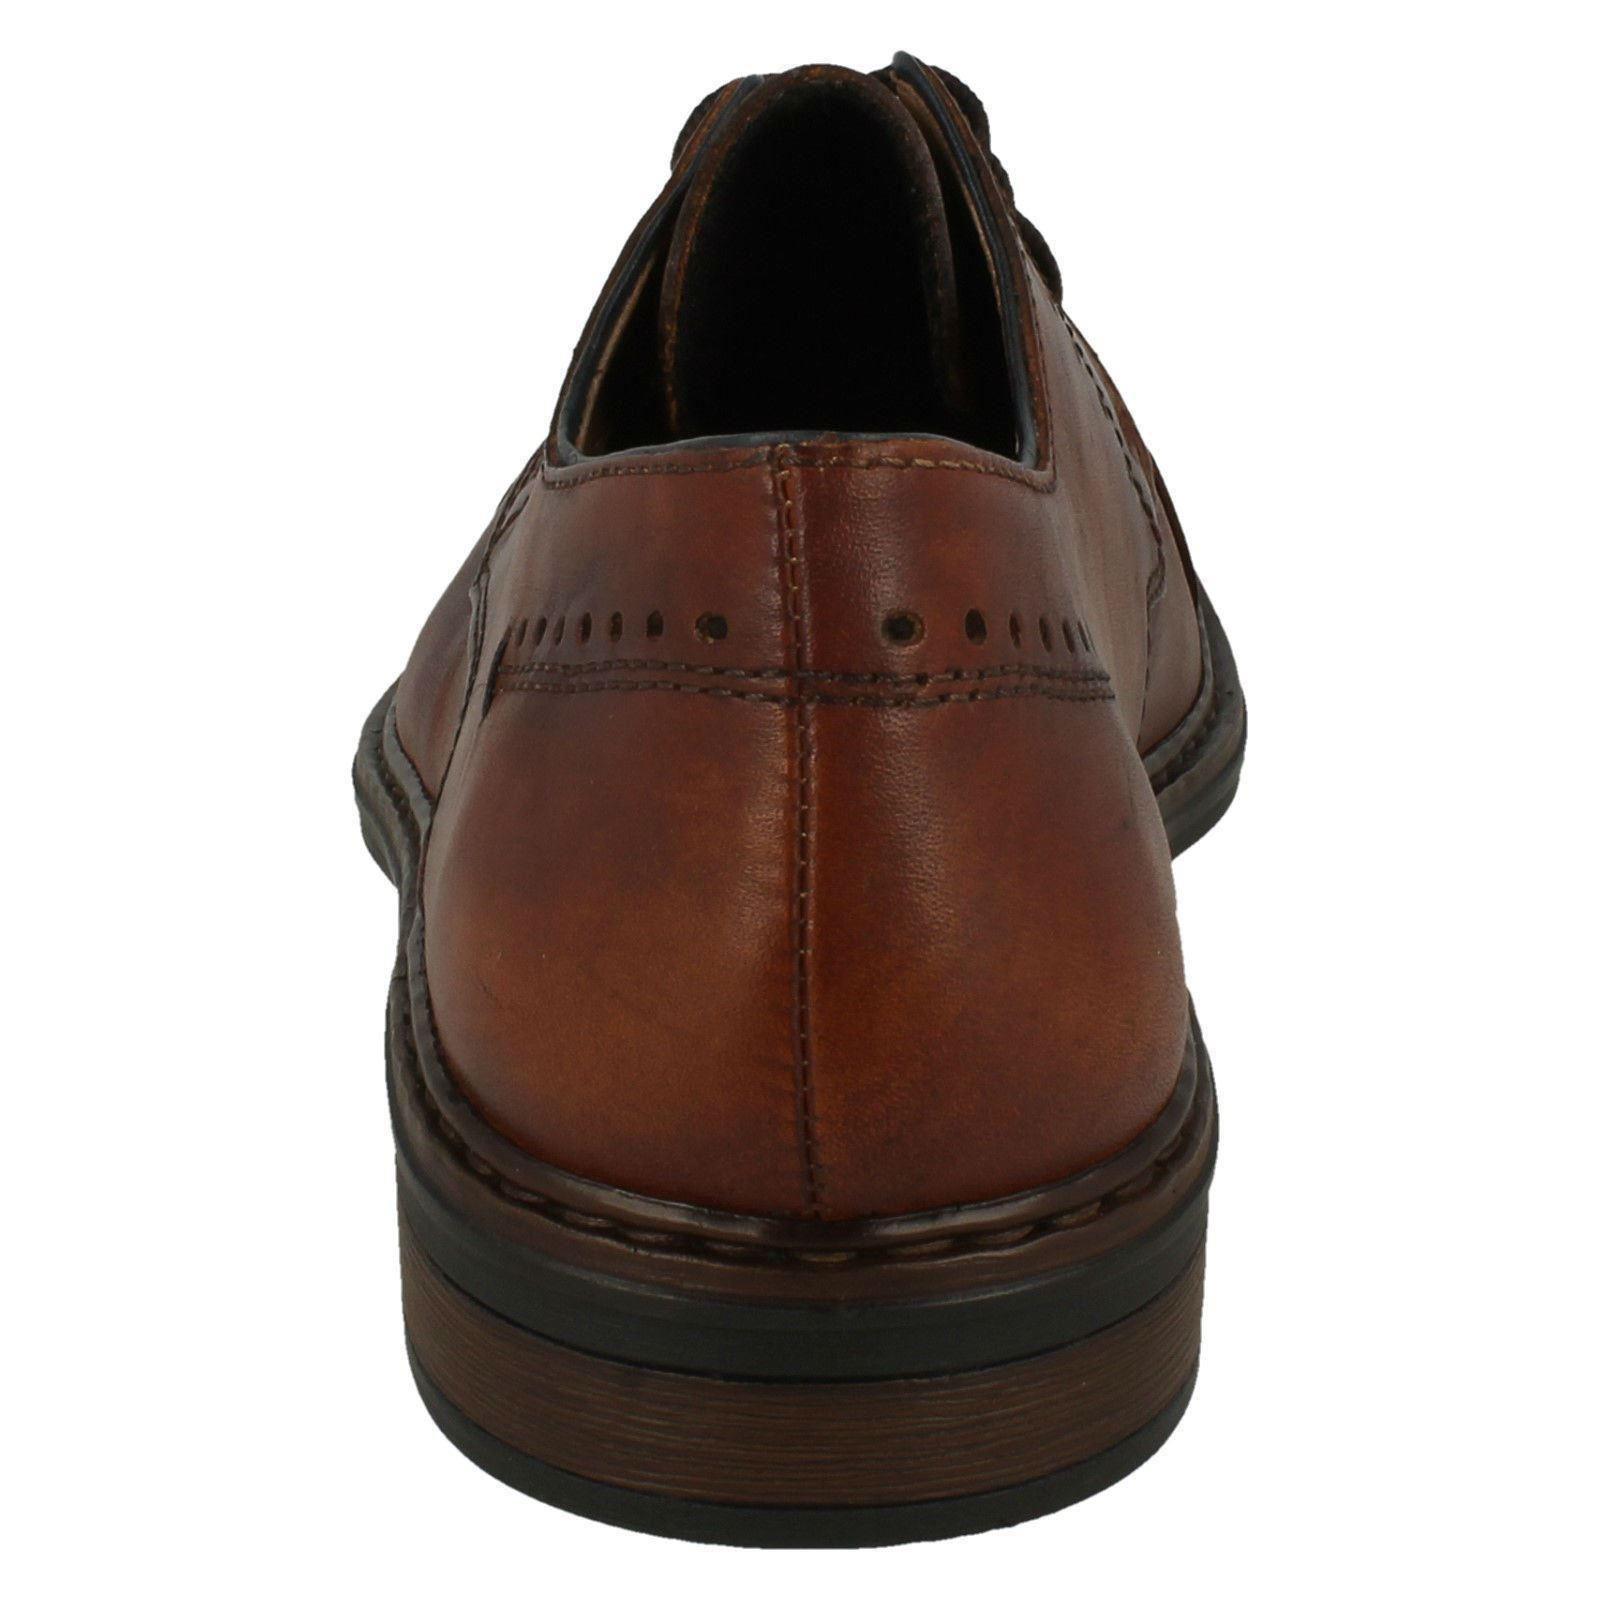 Herren Rieker 17617 Lace Up Leder Smart Formal Toe Cap Schuhes 17617 Rieker 0ad3f9